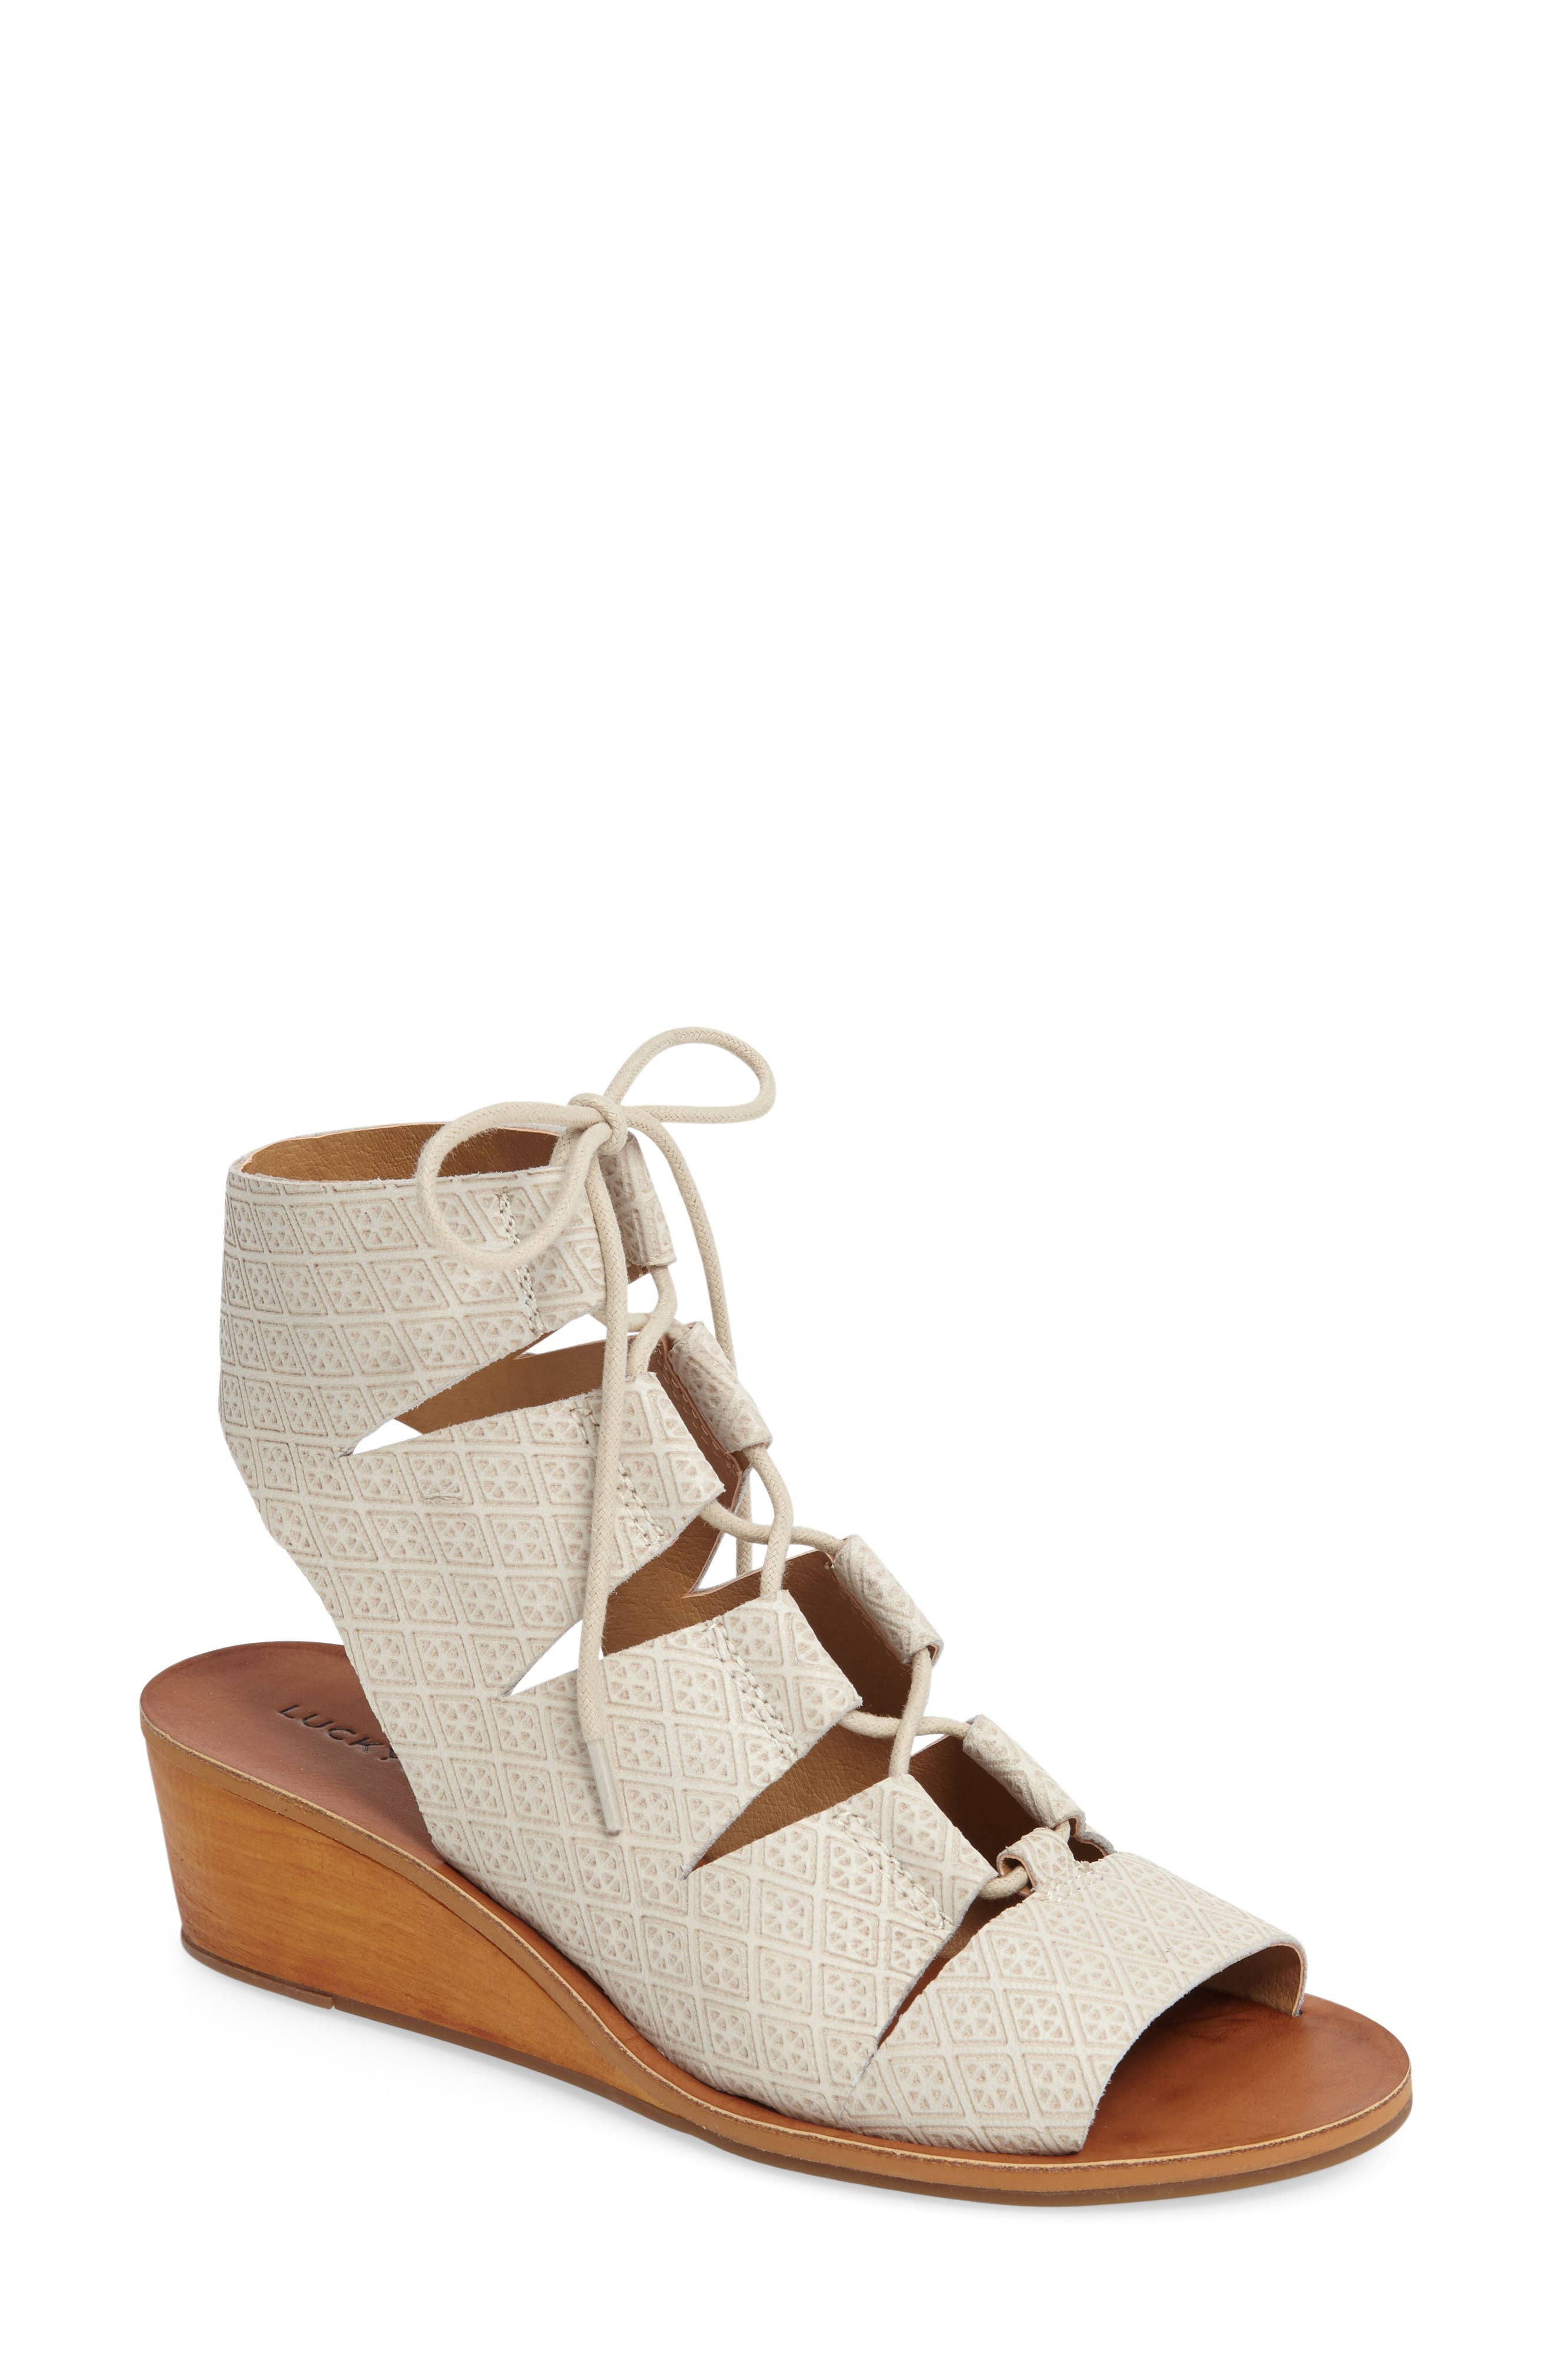 Gizi Wedge Sandal,                         Main,                         color, Sand Shell Leather